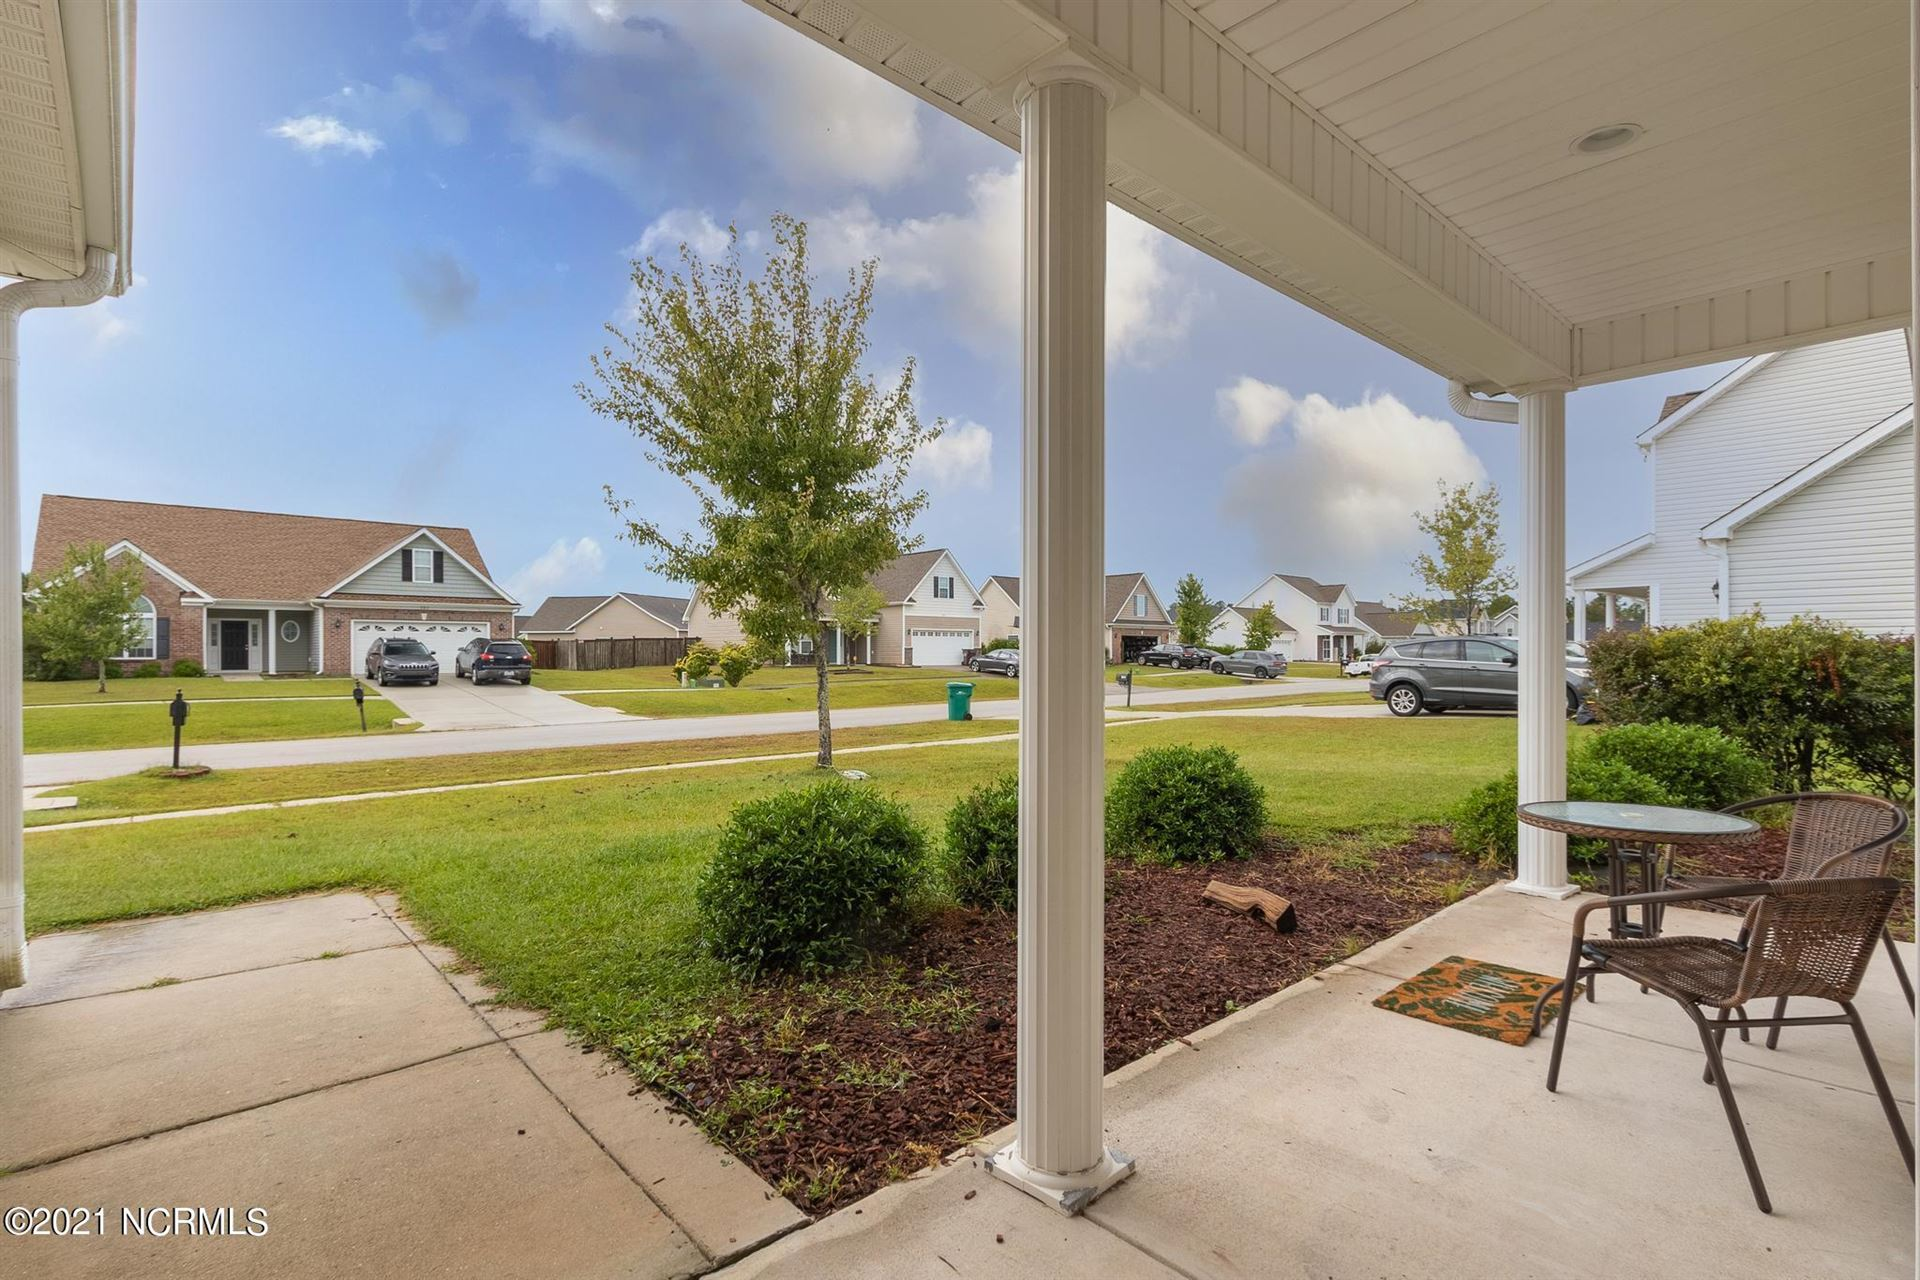 Photo of 158 Moonstone Court, Jacksonville, NC 28546 (MLS # 100295268)